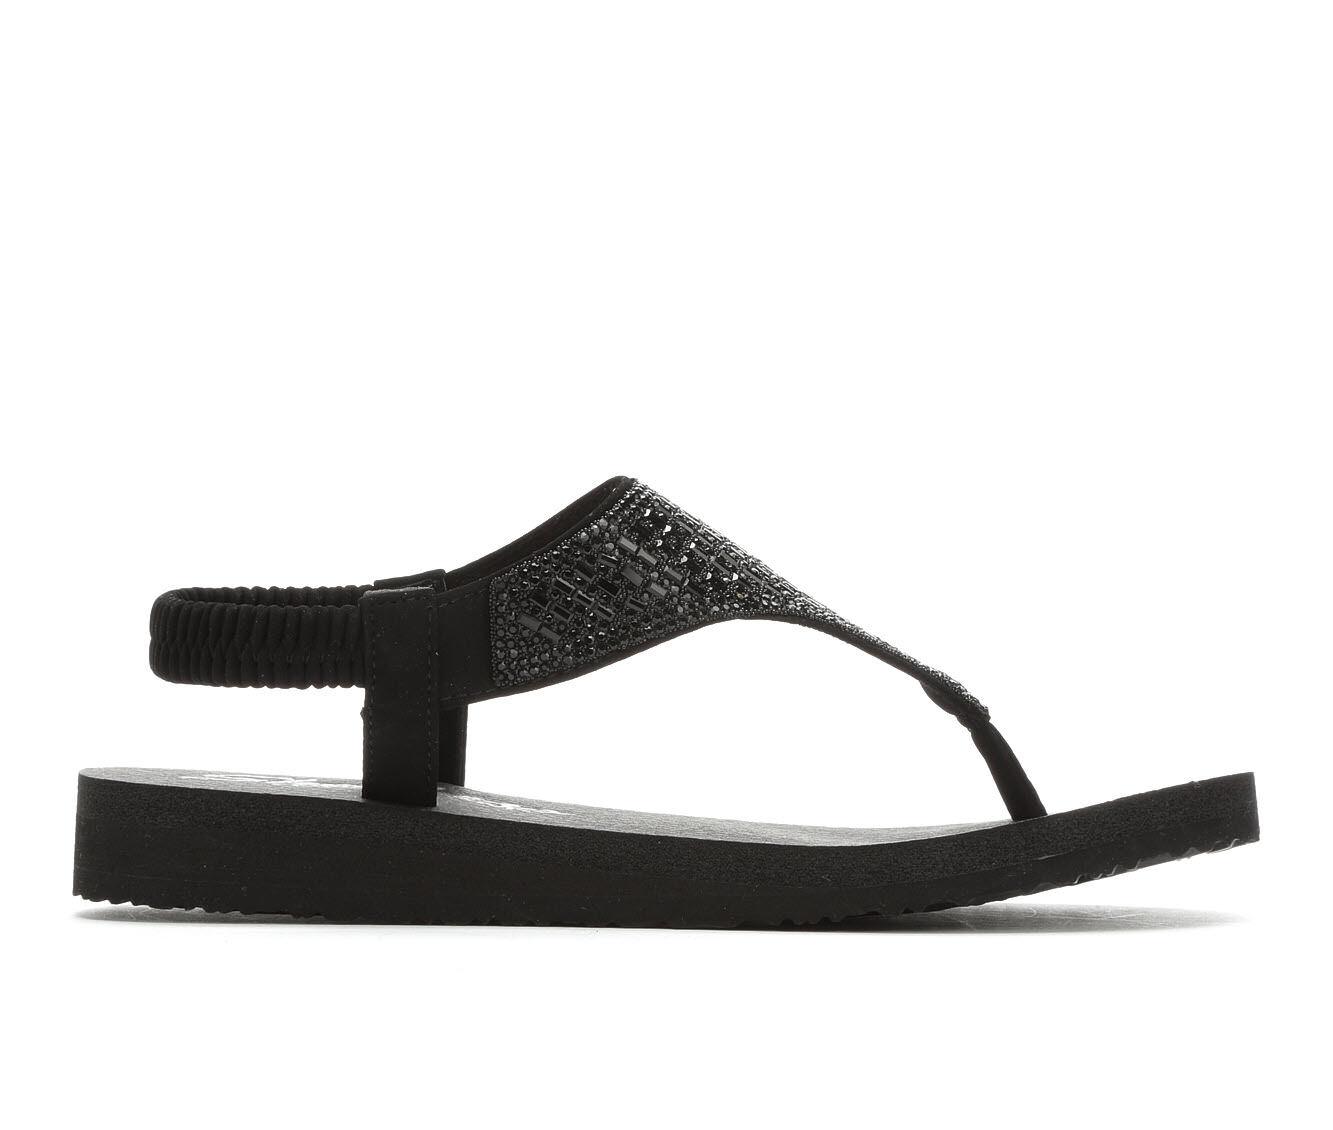 Women's Skechers Cali Meditation Rock Crown Sandals Black